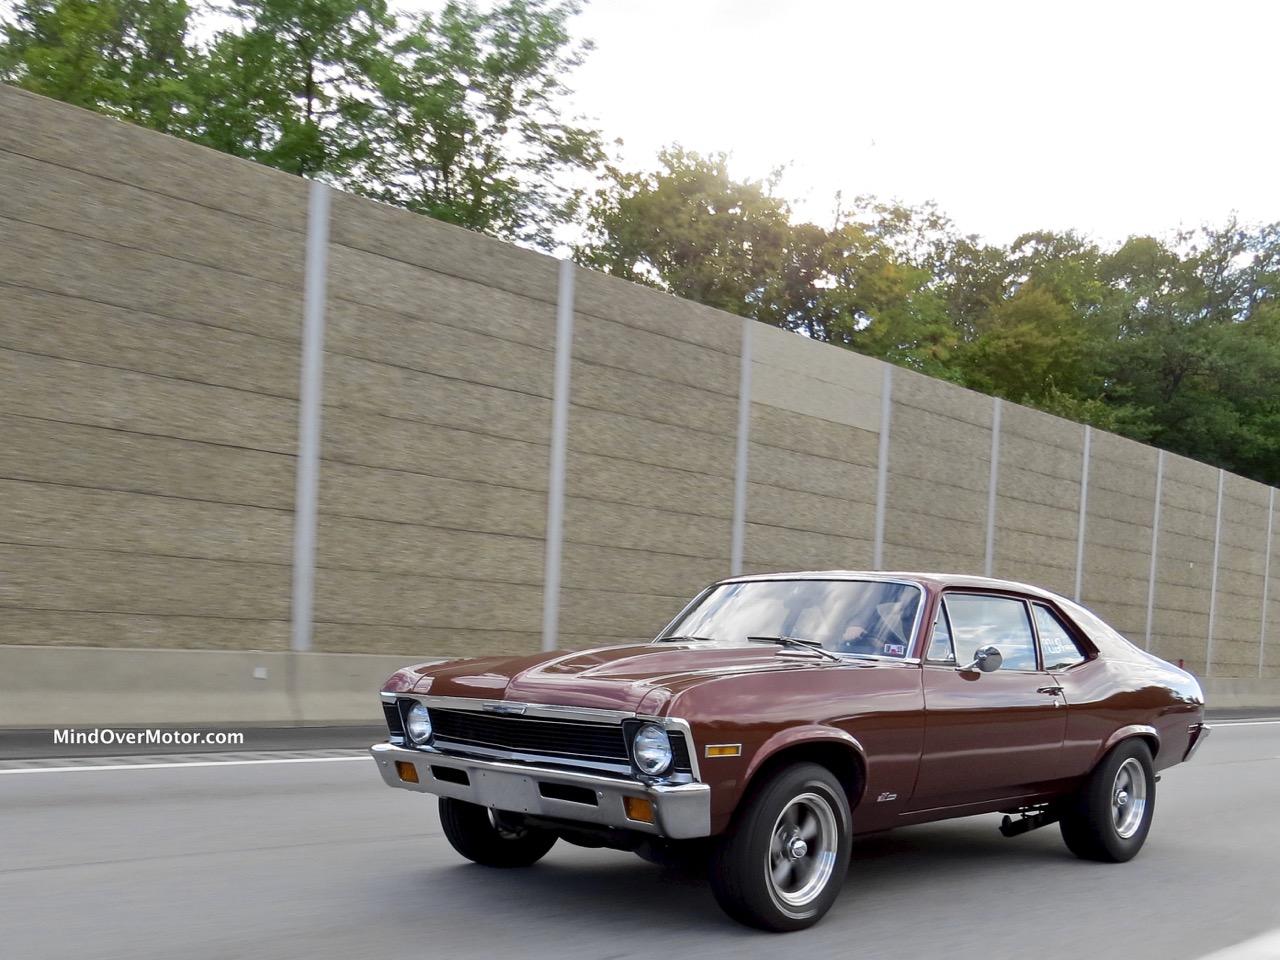 1969 Nova Mild Custom